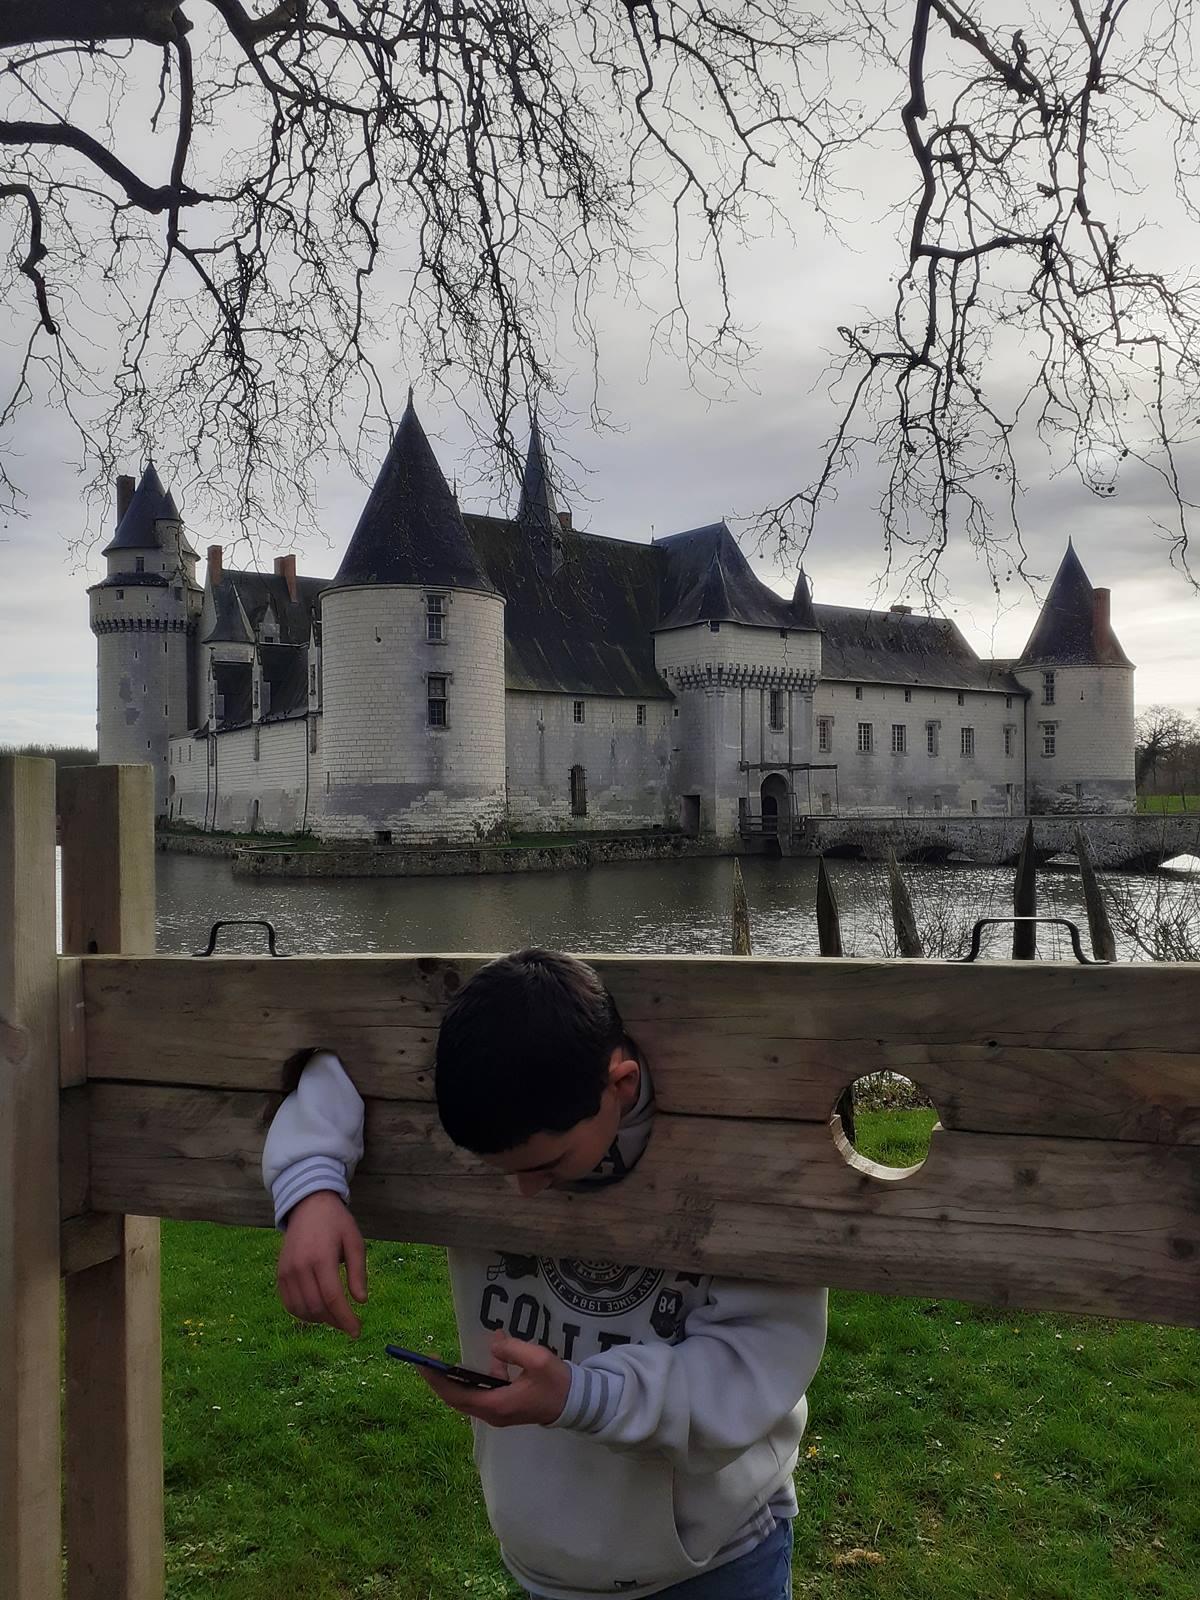 Chateau plessis bourre maine loire tourisme20200222 170440